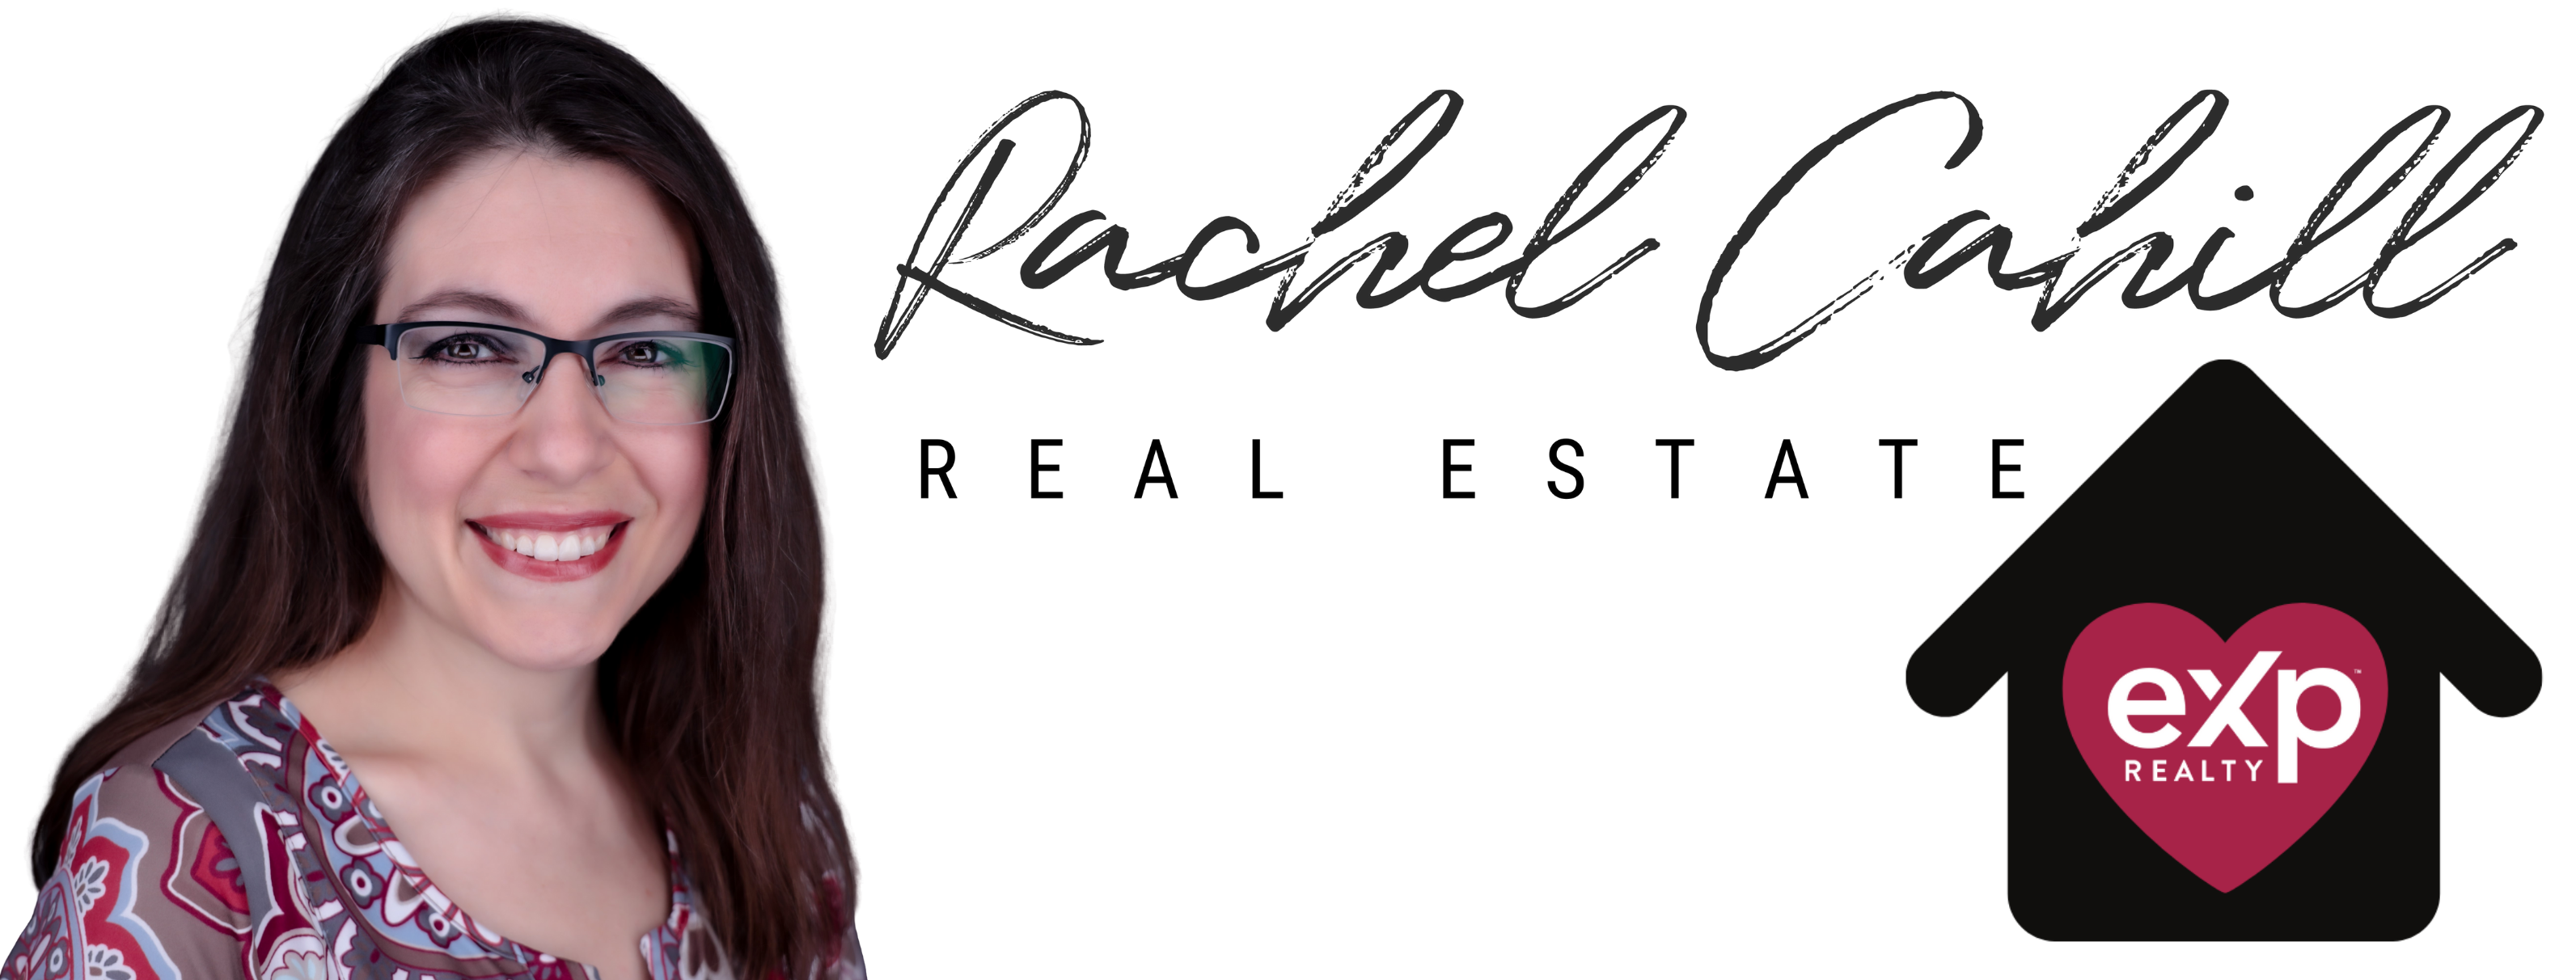 RACHEL CAHILL